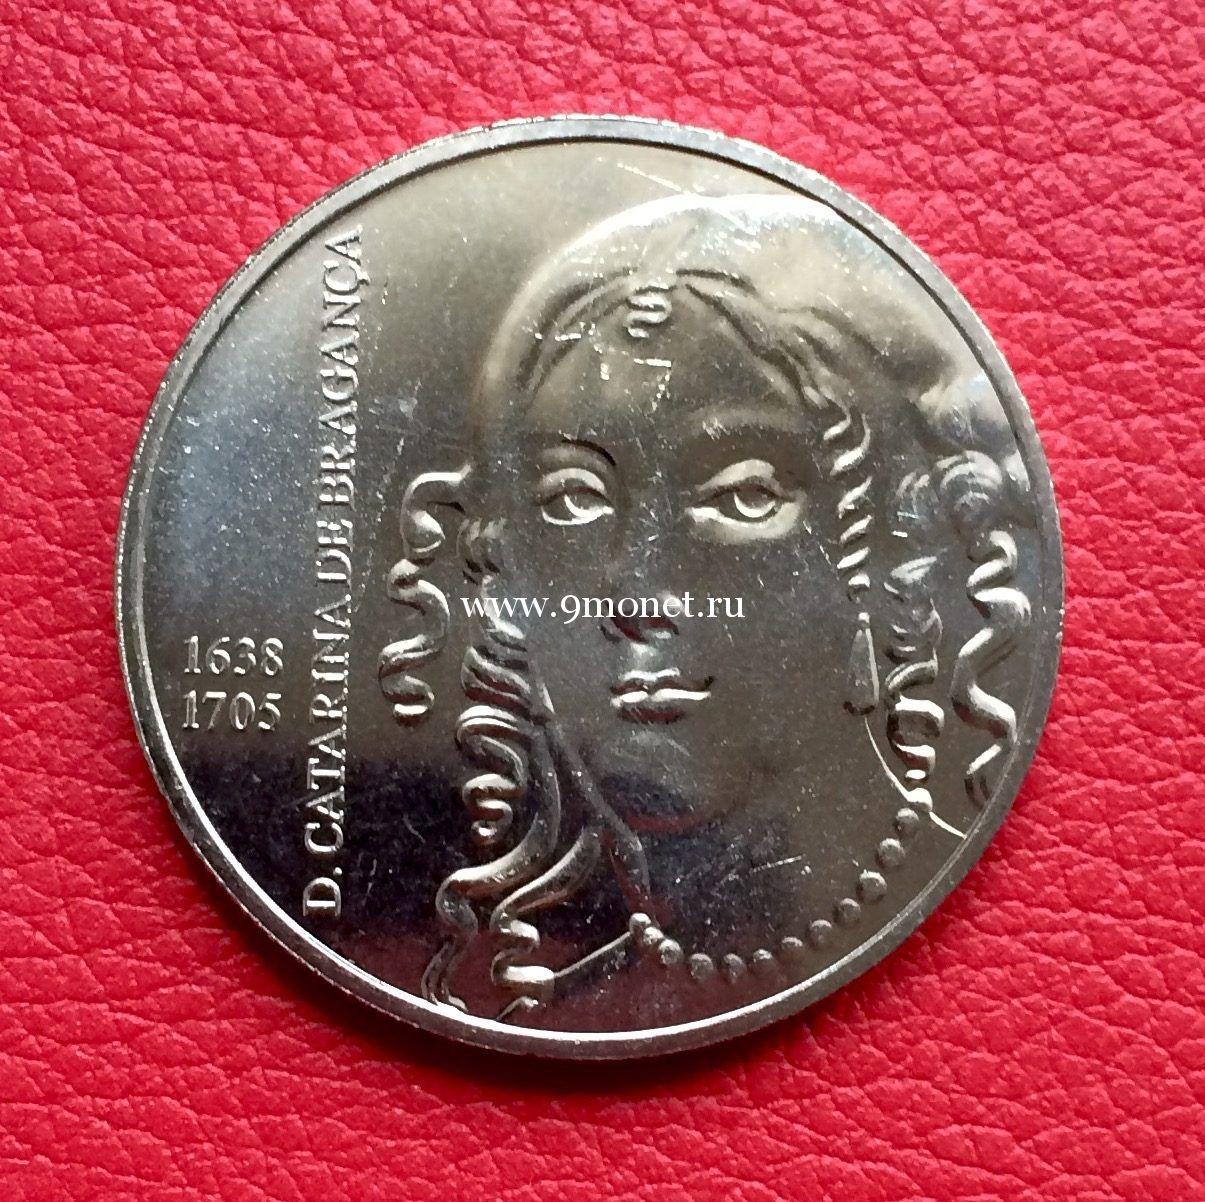 Монета 5 Евро Португалия 2016 года. Екатерина Брагансская.